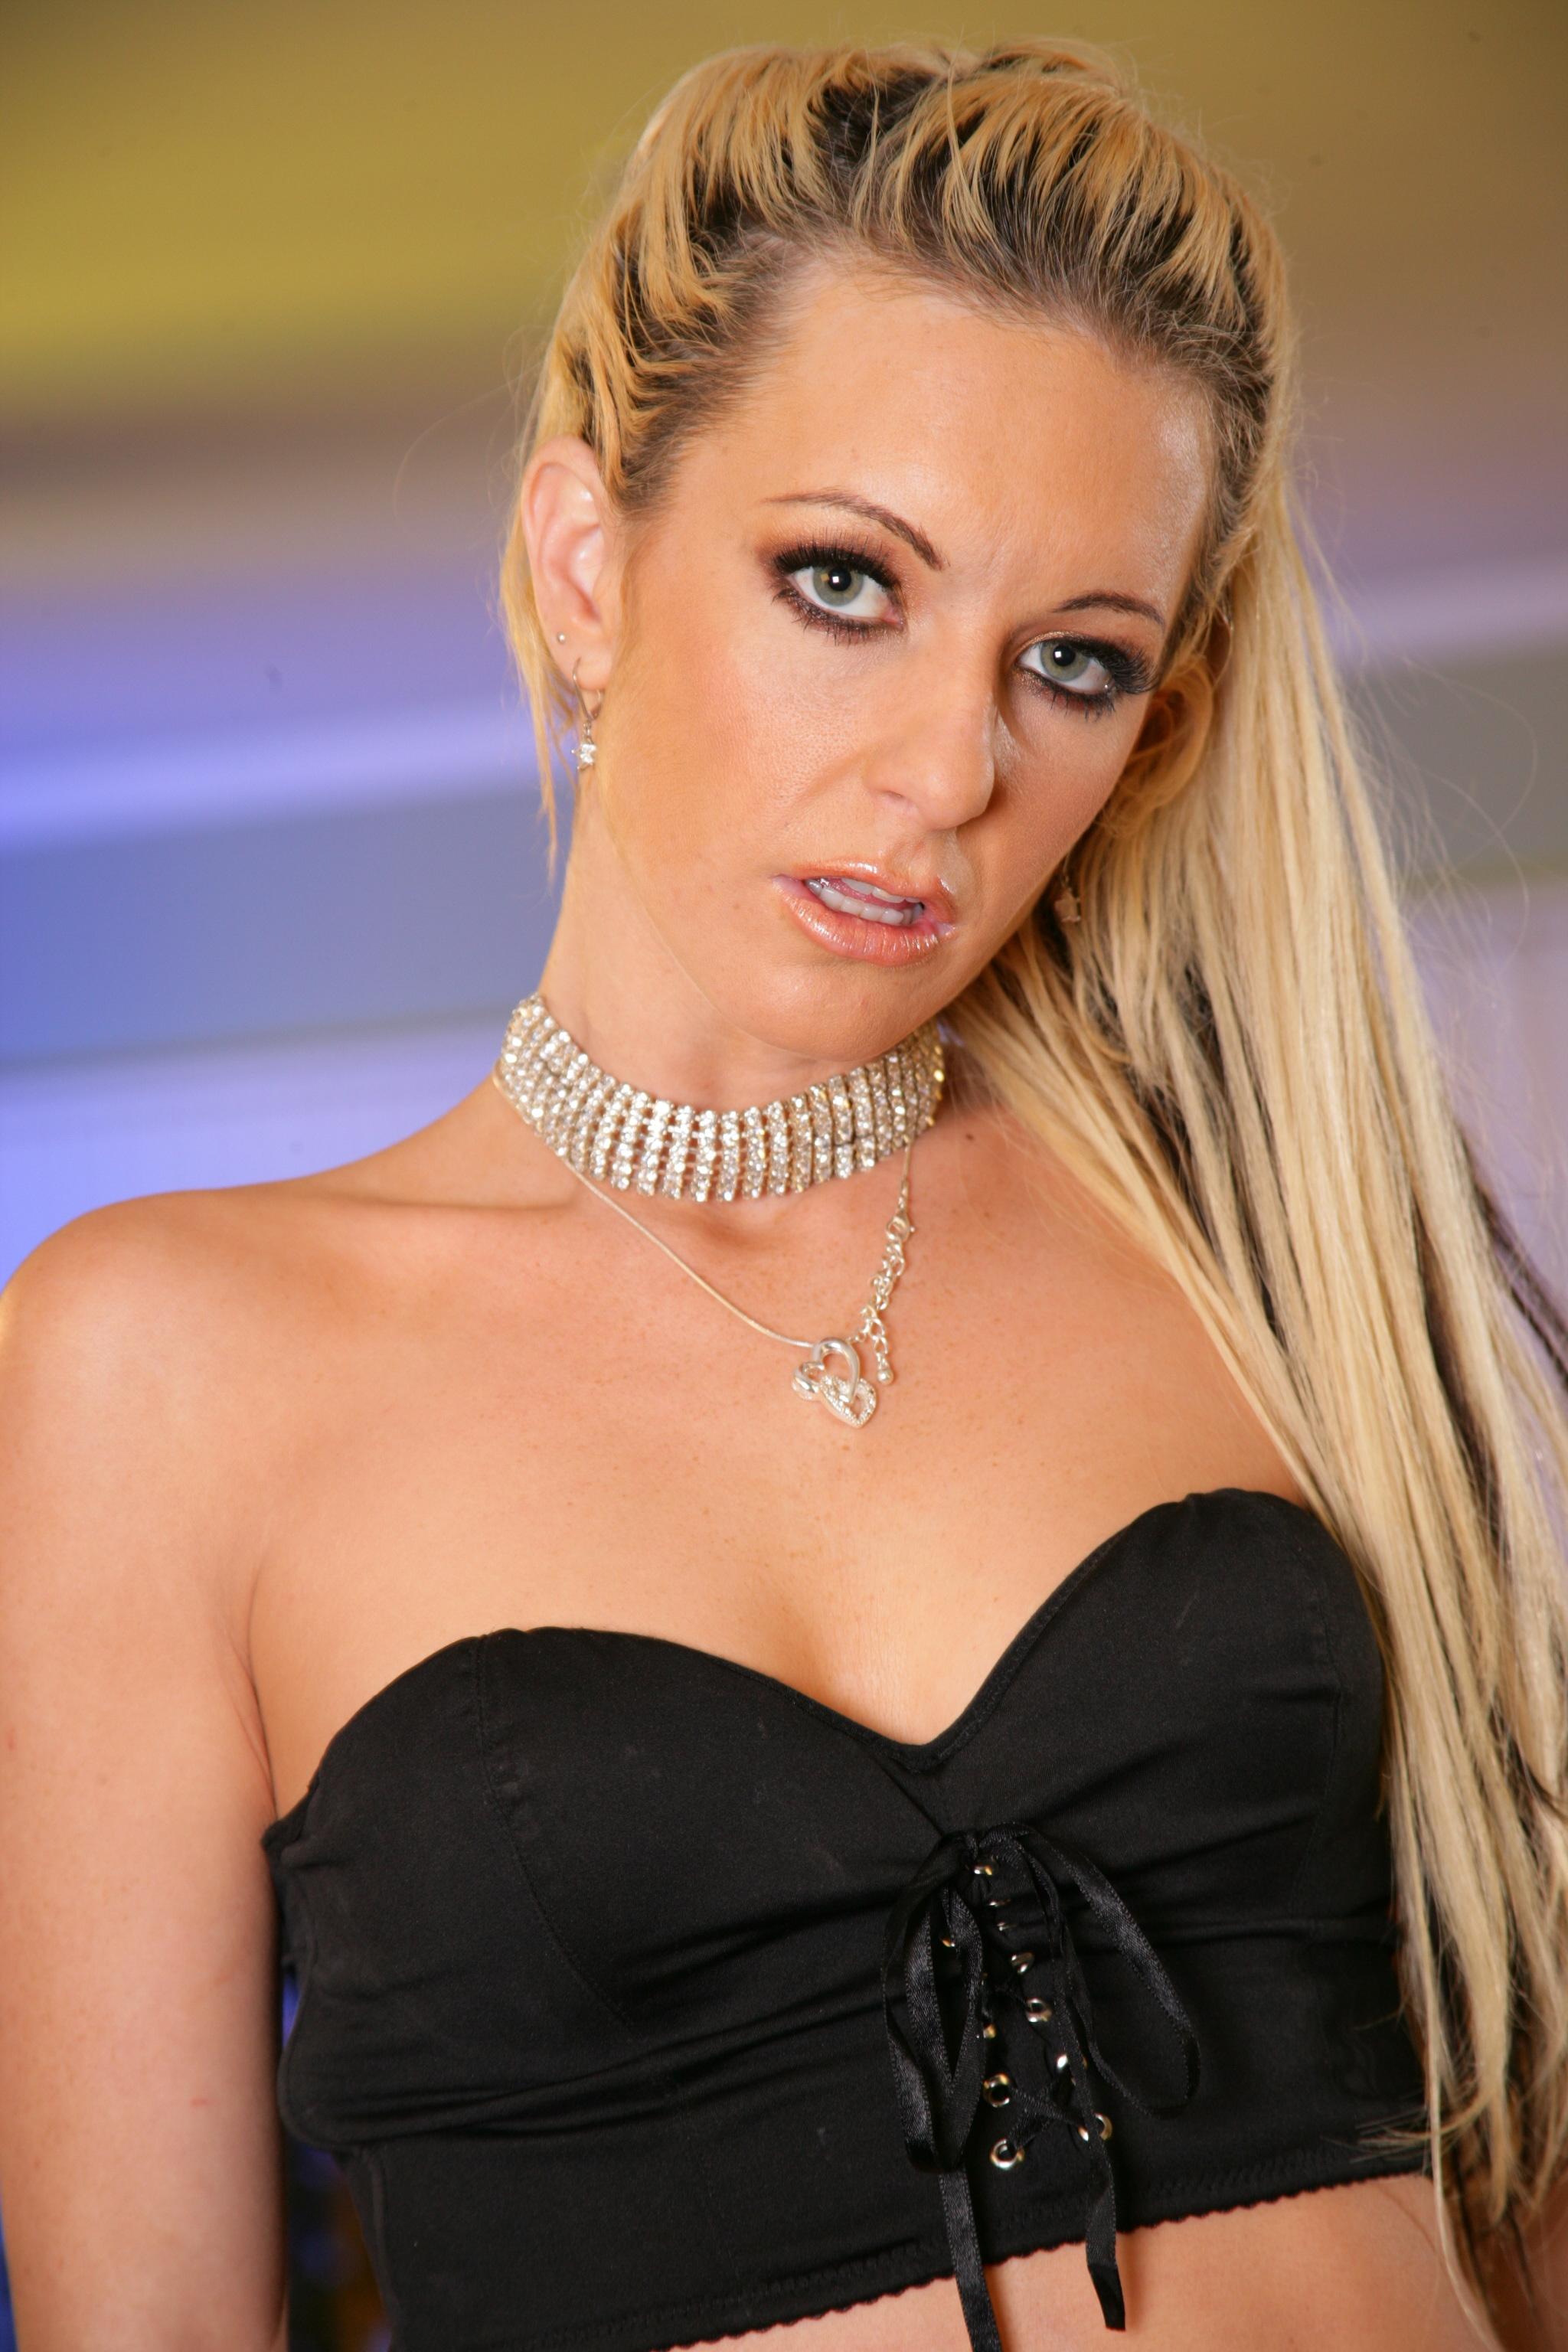 Michelle Sweet